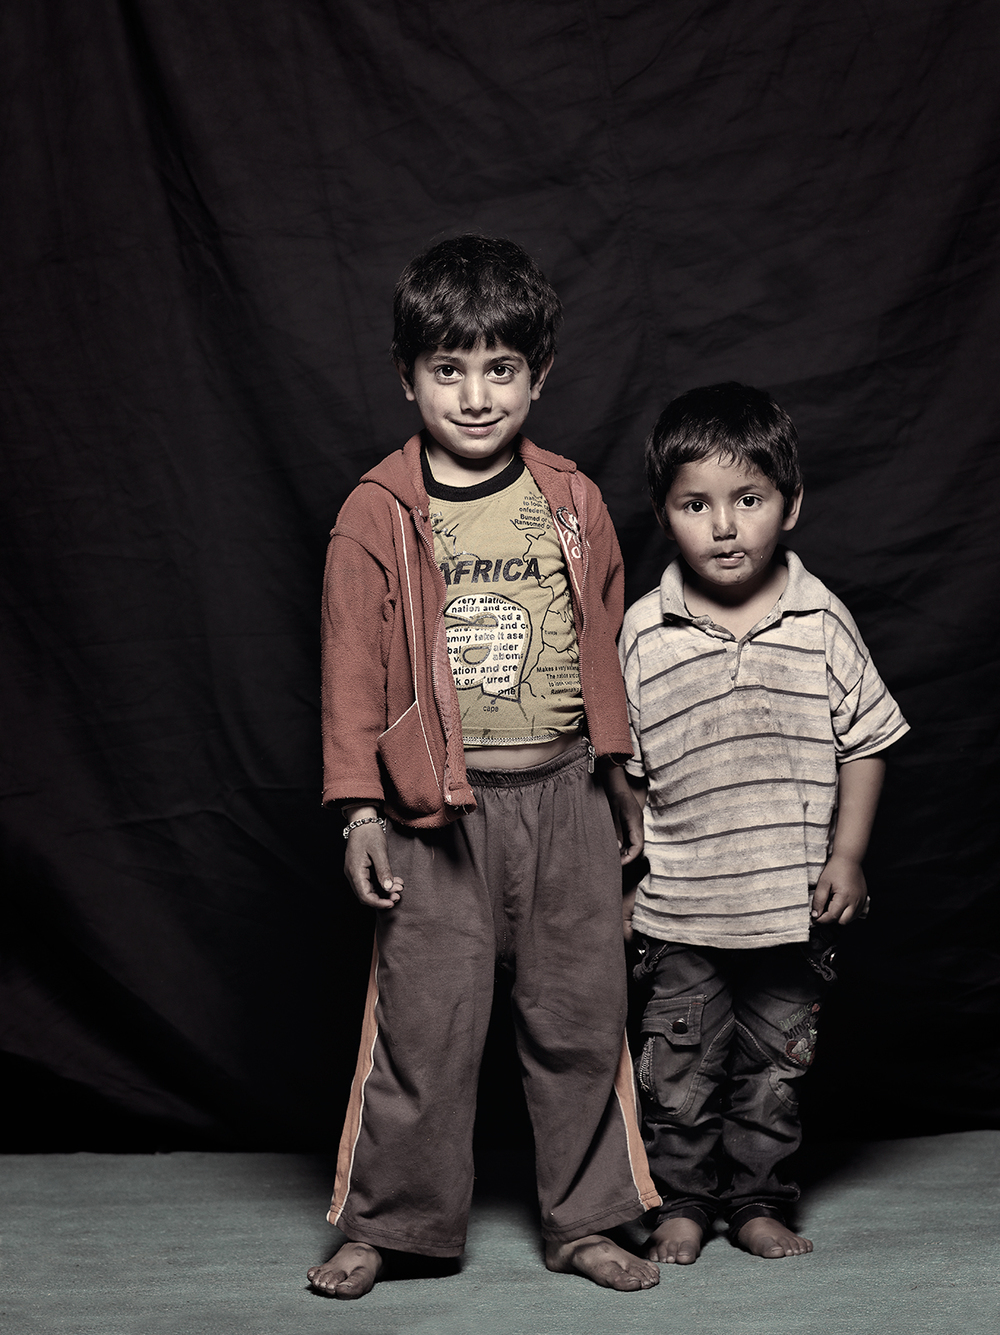 Adil Shah, 4 and Muzammil Shah, 3, D-camp, 2013